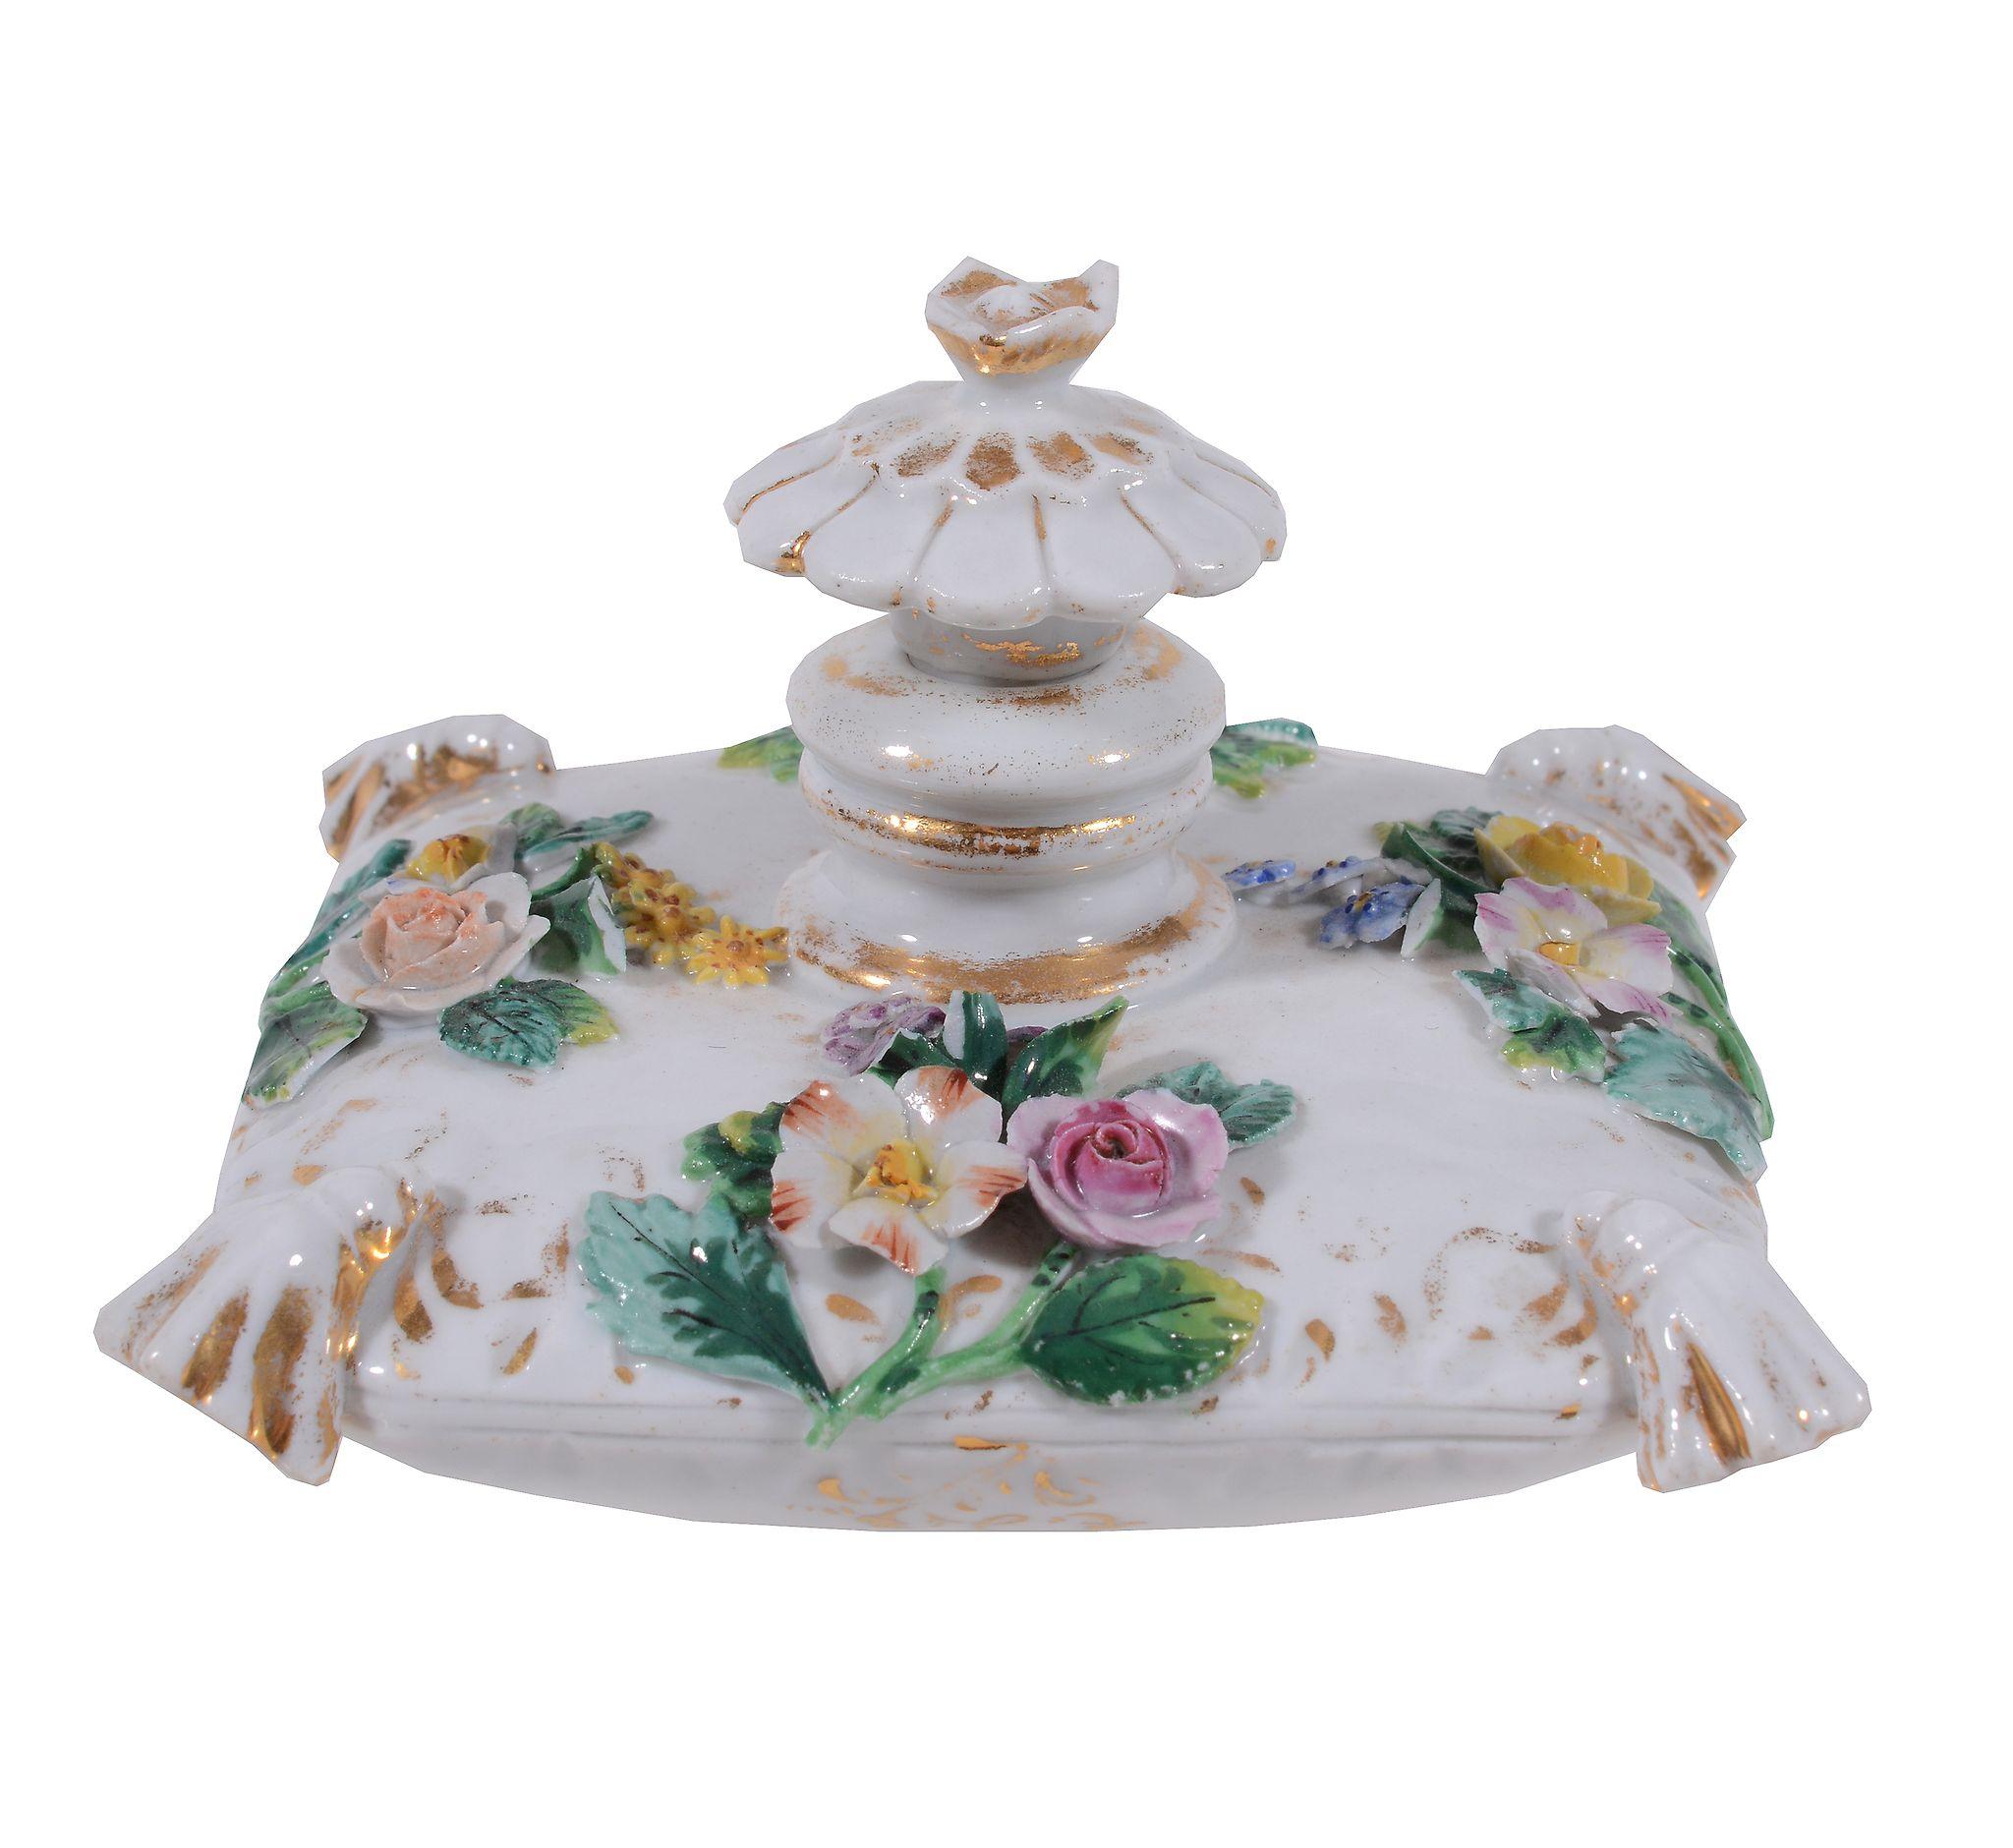 A Meissen model of a flower-encrusted scent bottle annd stopper